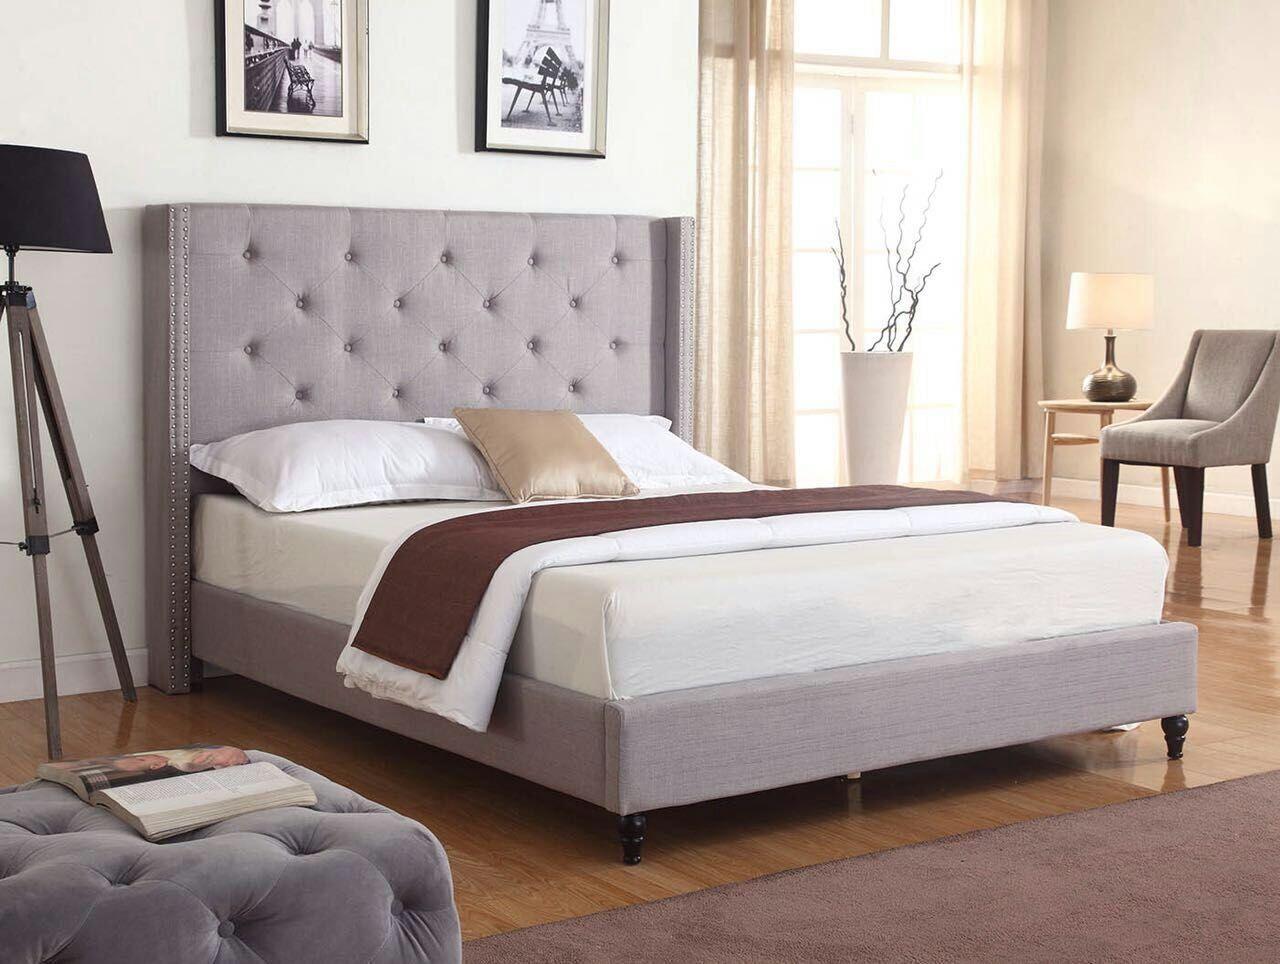 GREY Fabric WingBack KING Size Platform Bed Frame & Slats Mo